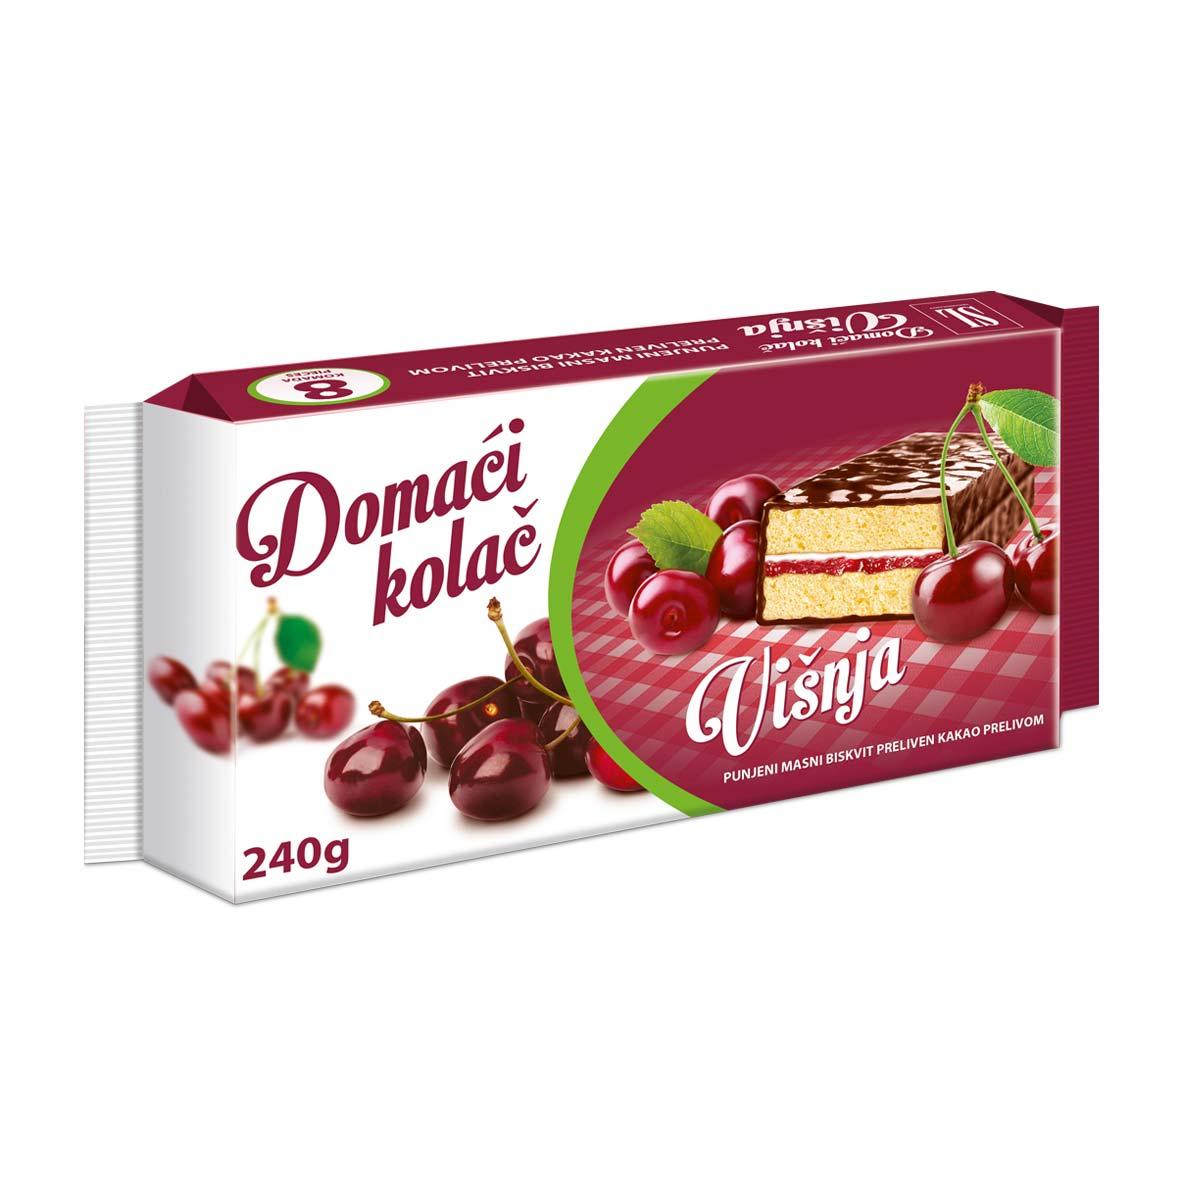 Domaci-Kolac-Visnja-240g